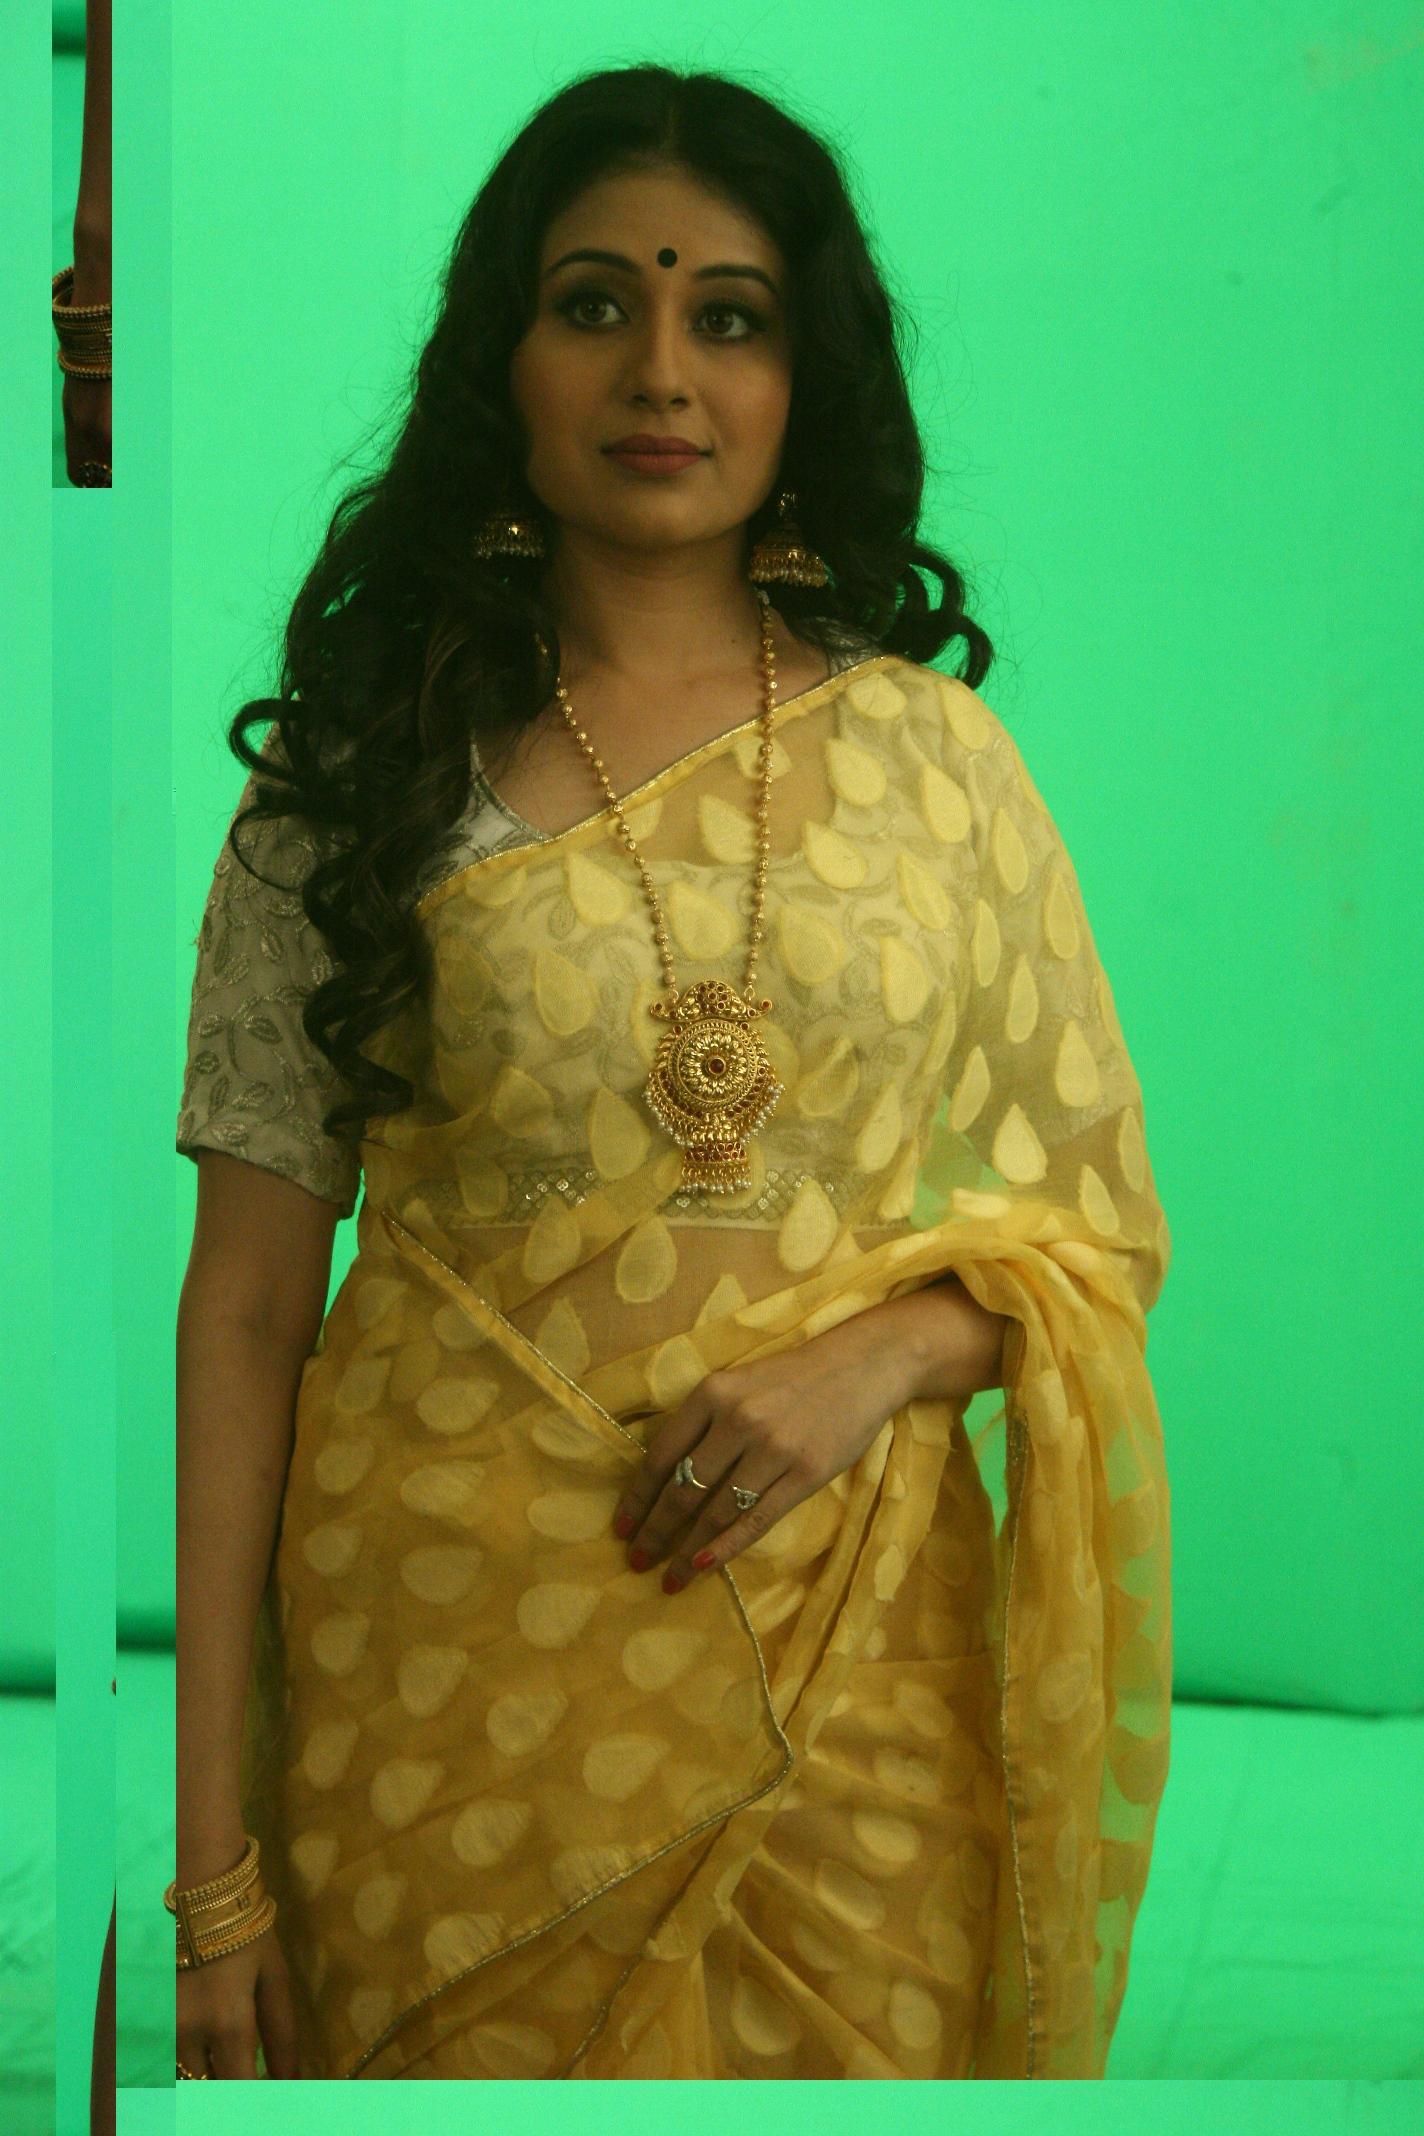 Paridhi Sharma 2010 nudes (49 photo), Pussy, Paparazzi, Boobs, braless 2015